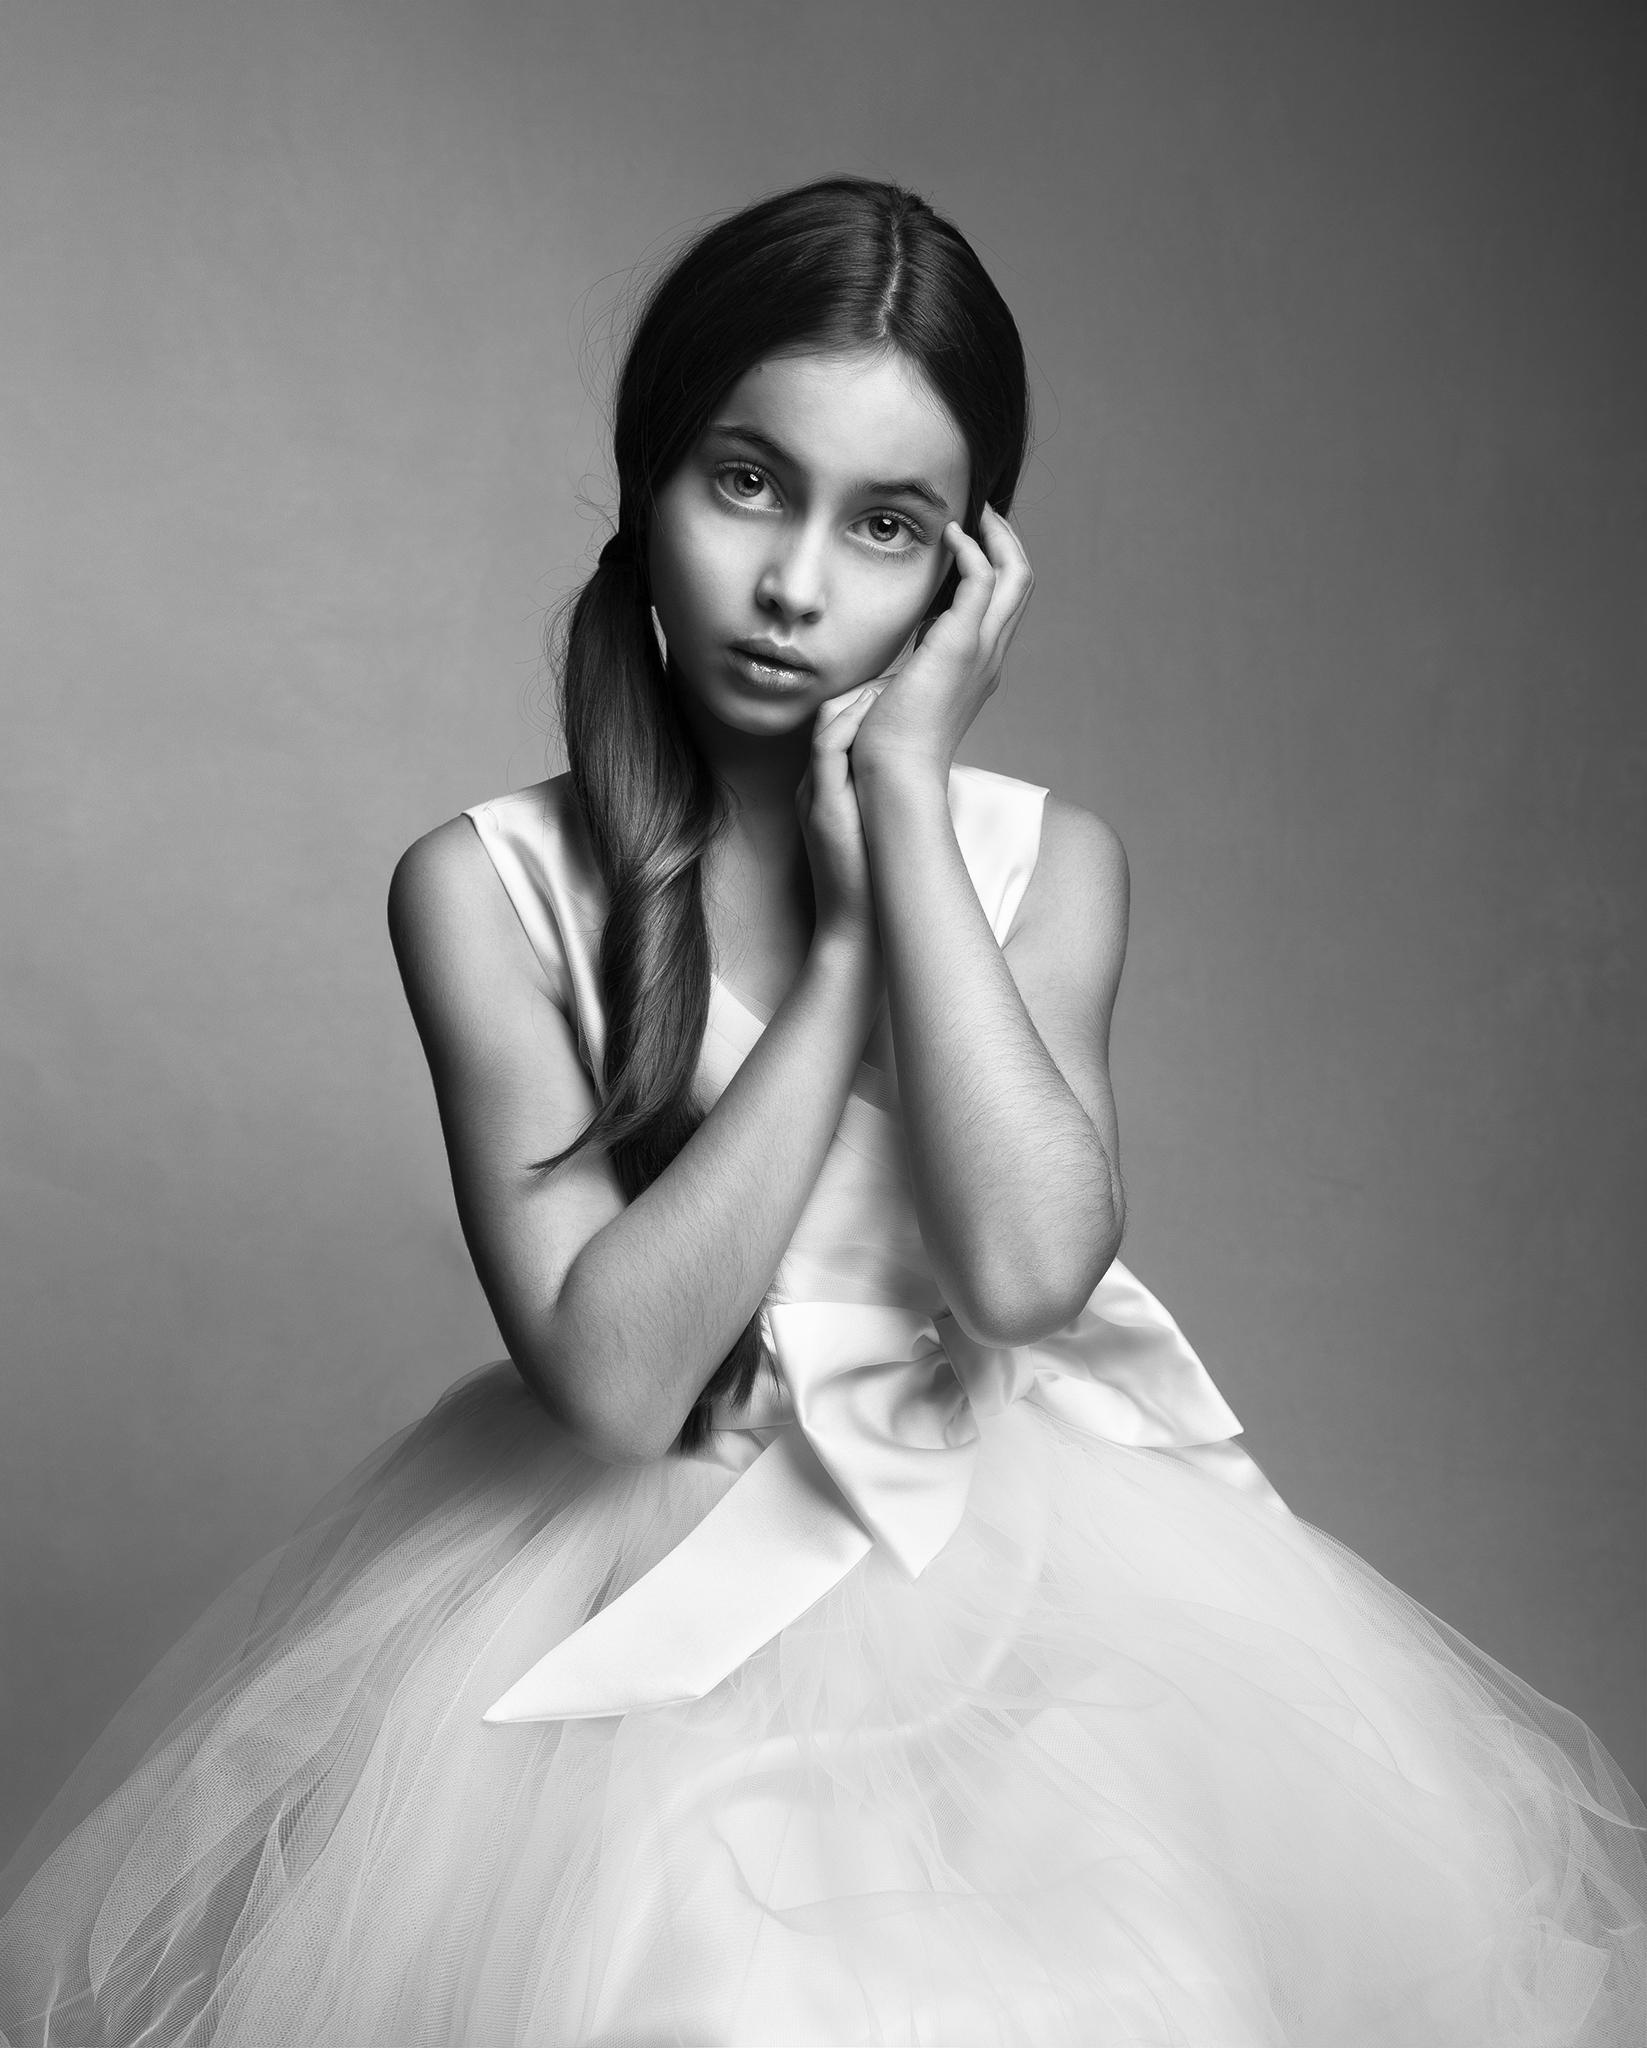 Elizabethg_fineart_photography_elissa_rayandrobin_004a.jpg